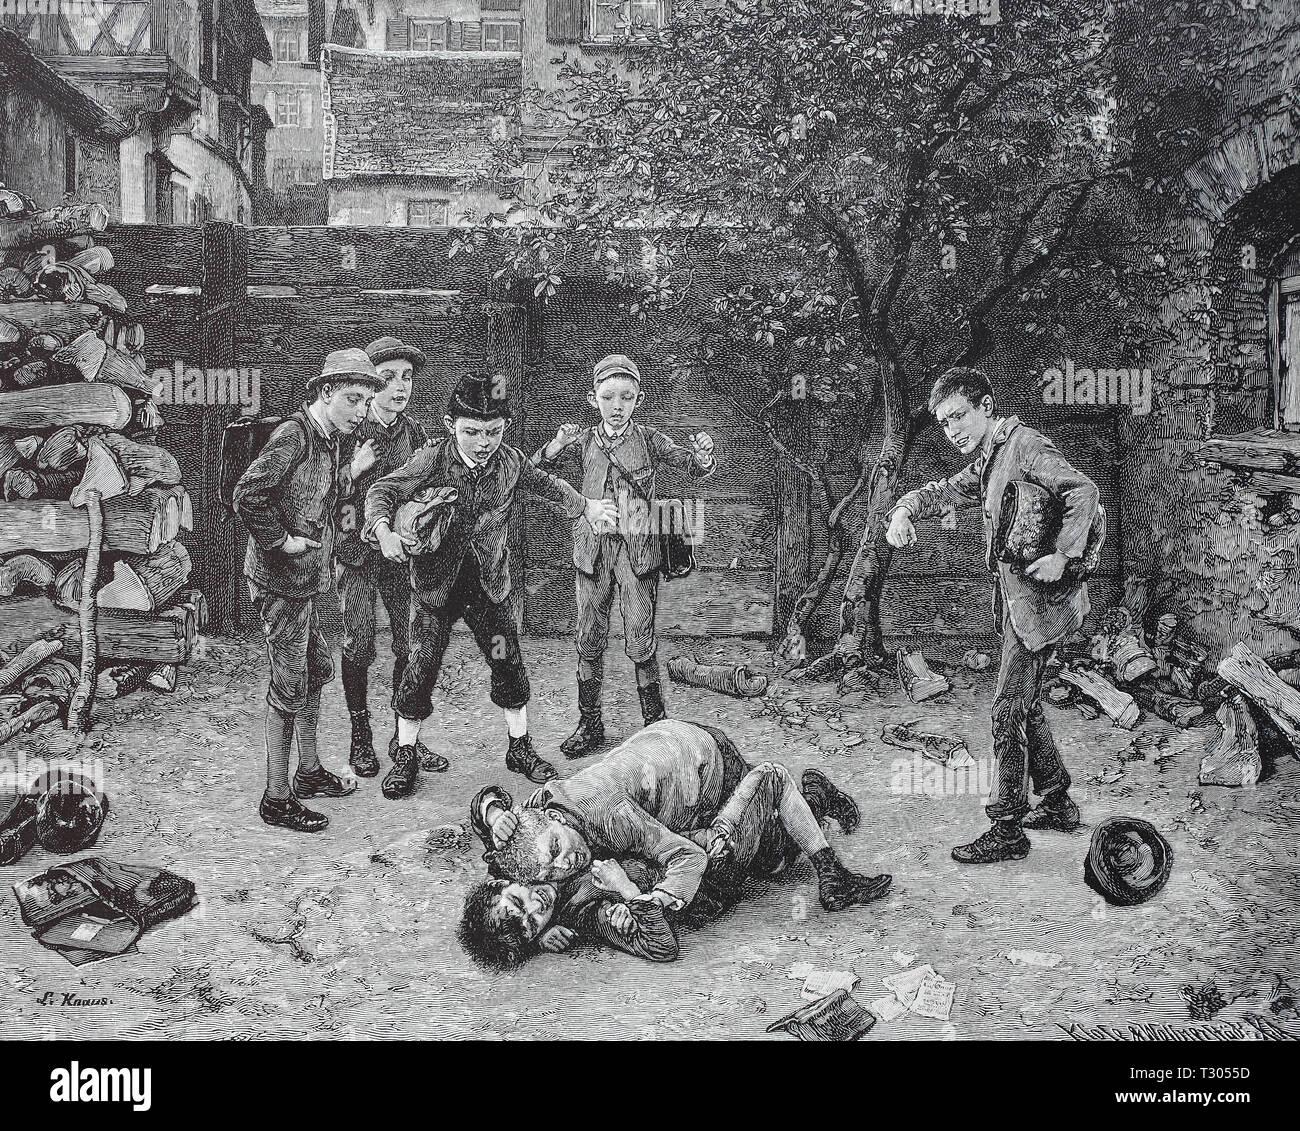 Digital improved reproduction, School boys with the playful duel, Schuljungen beim spielerischen Zweikampf, from an original print from the 19th century Stock Photo